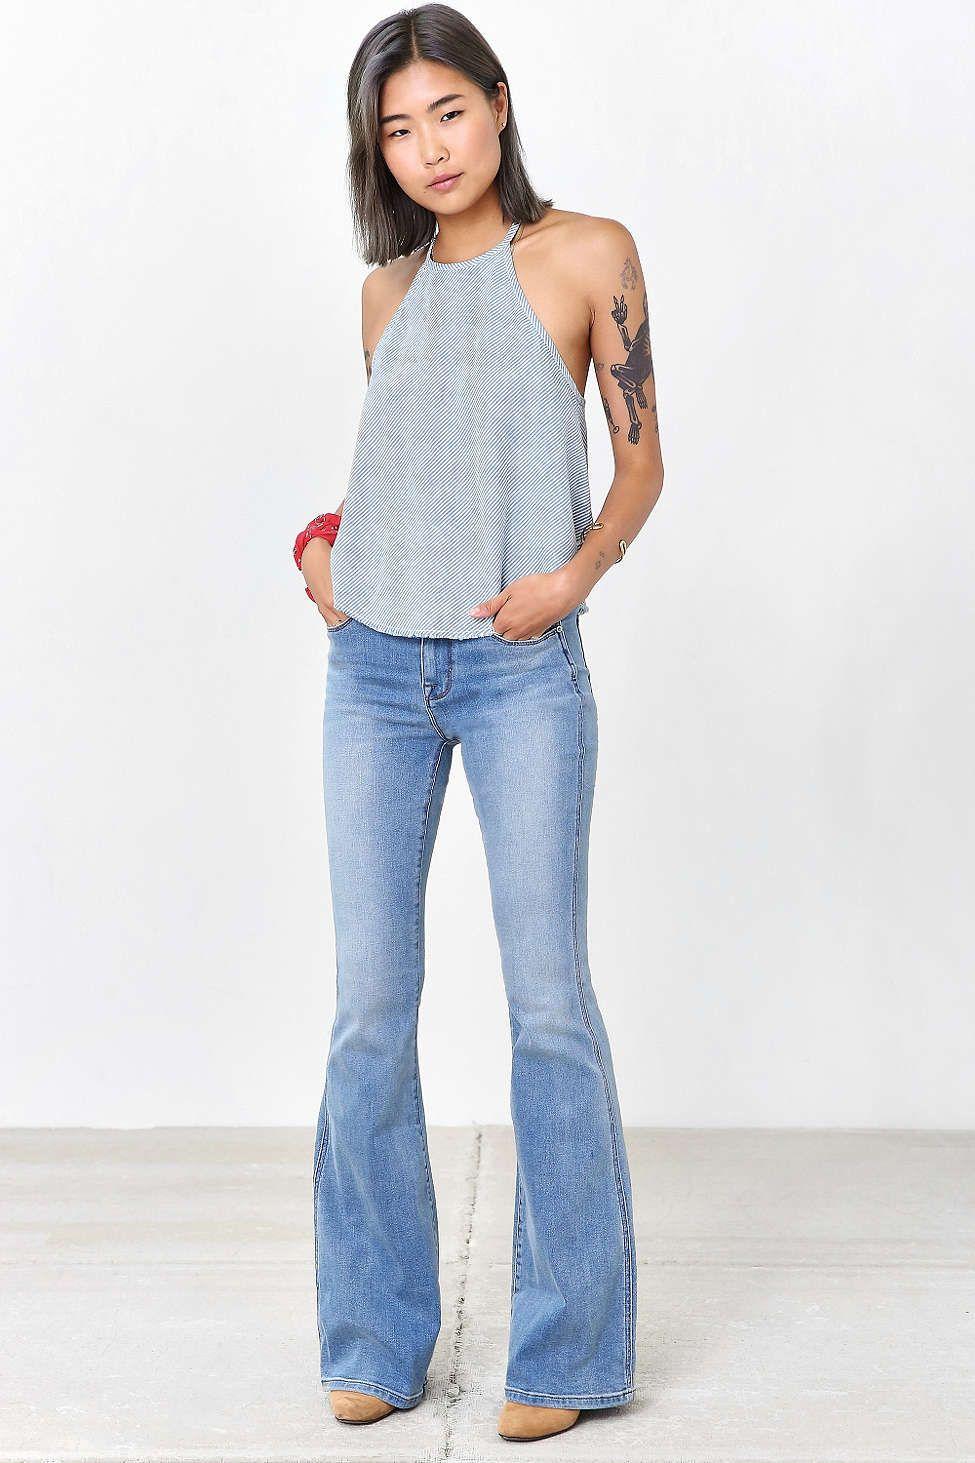 94141b01ec2cdc BDG Morrison High-Rise Flare Jean - Light Blue - Urban Outfitters